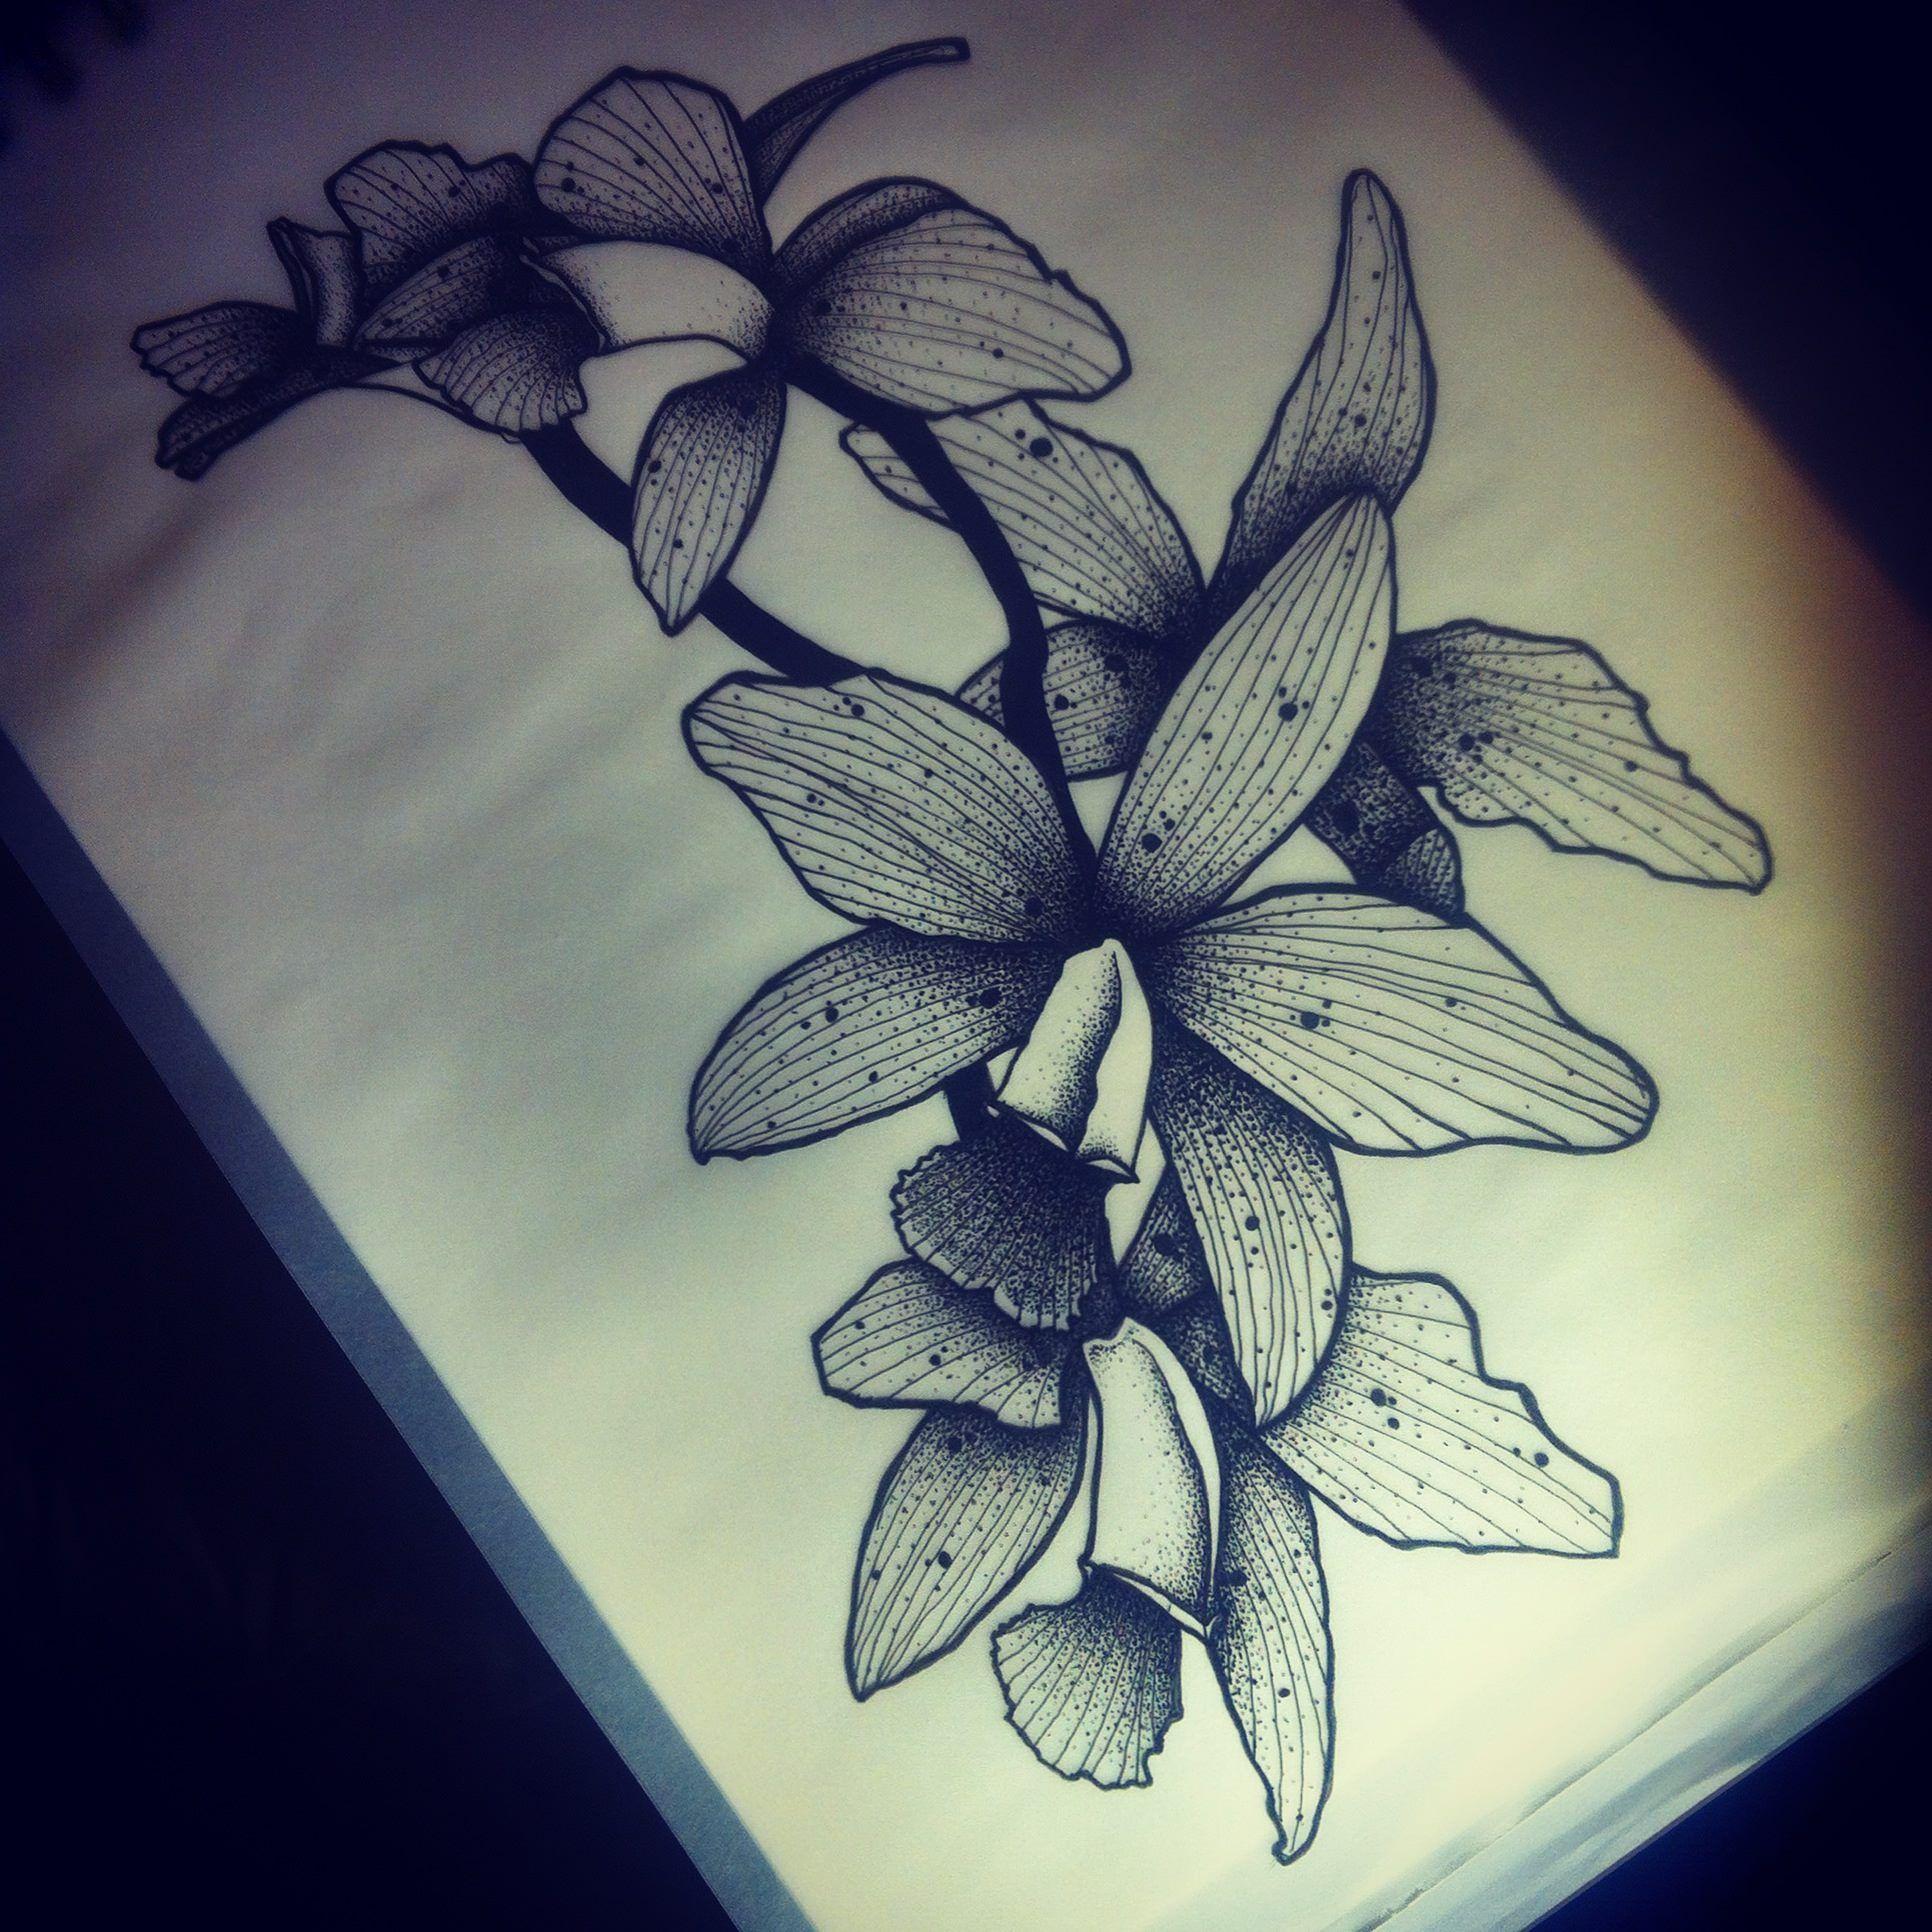 Guet Deep Tattoo Artist Orchid Tattoo Dot Work Tattoo Deep Tattoo